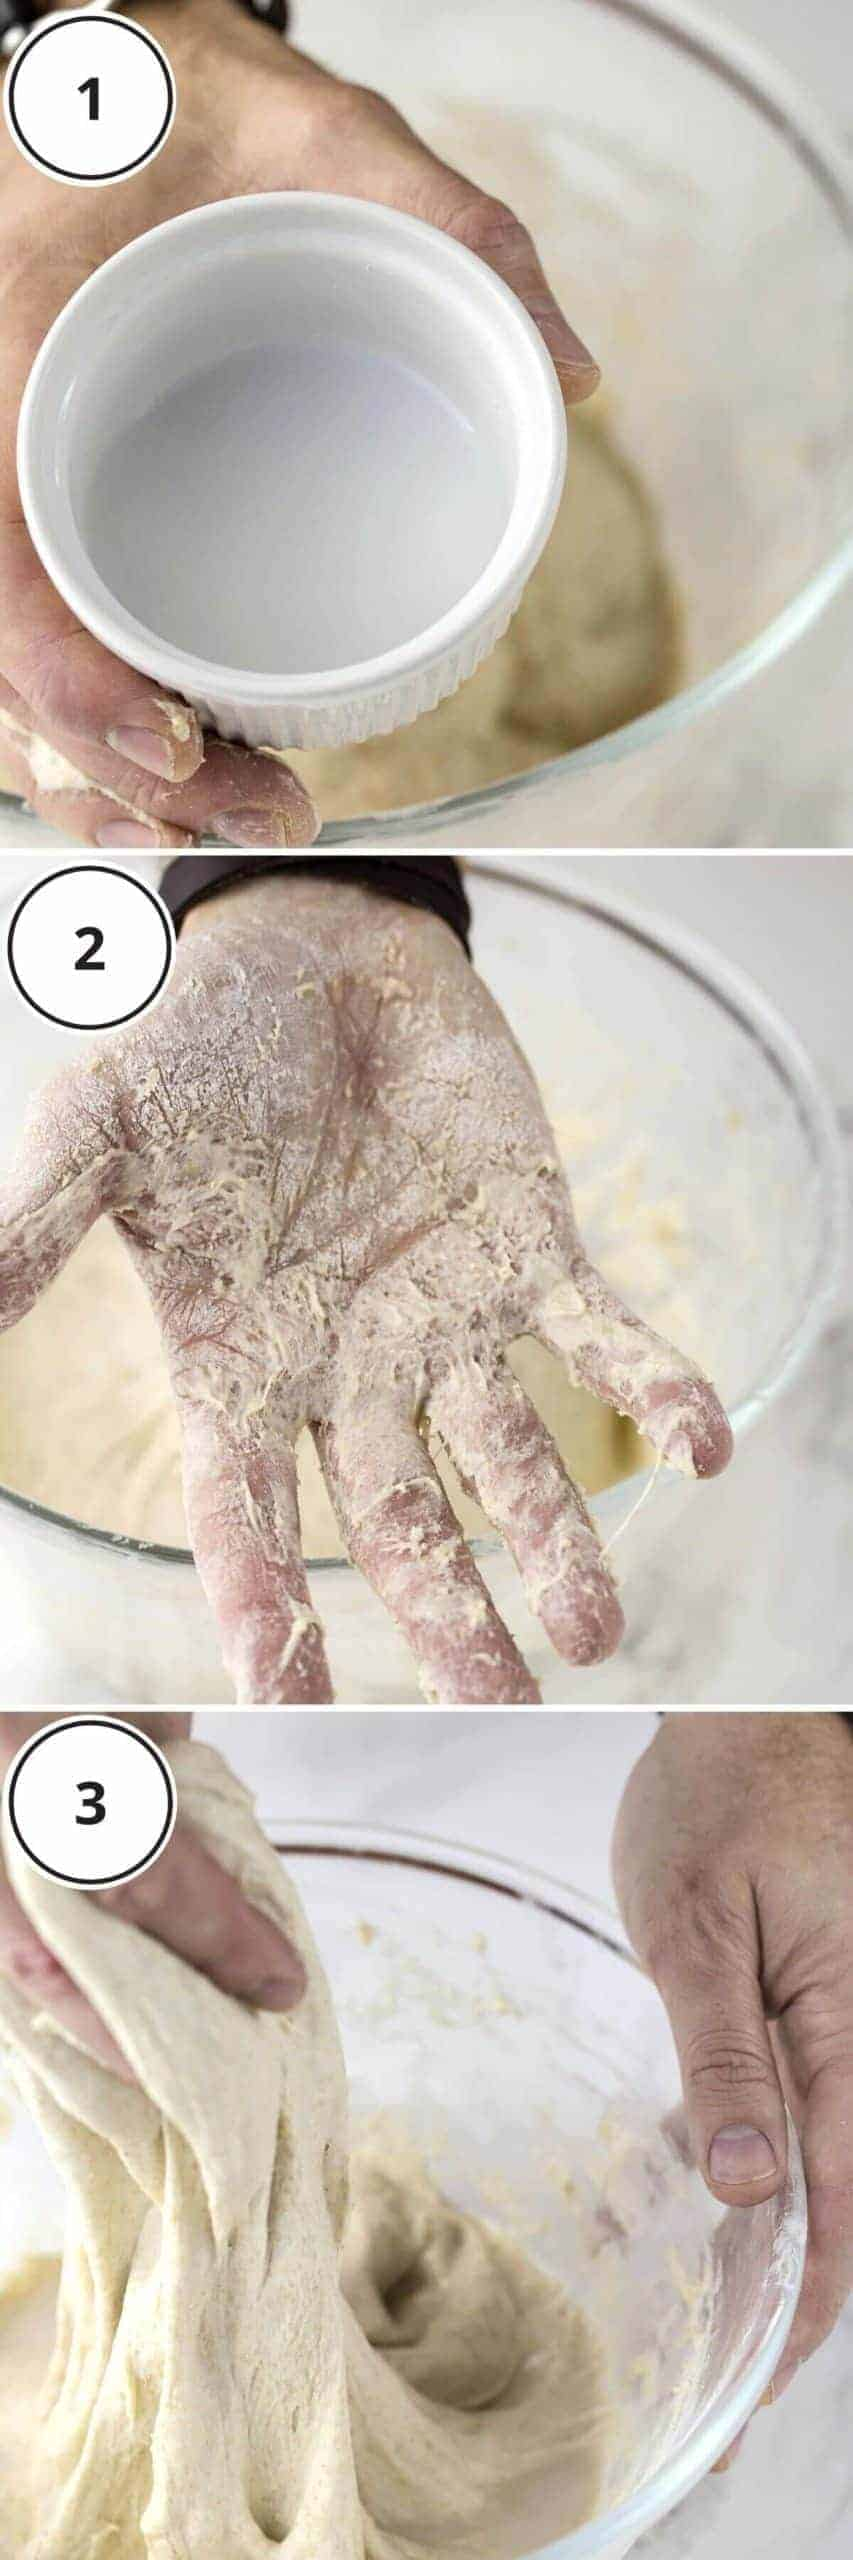 mixing salt into sourdough